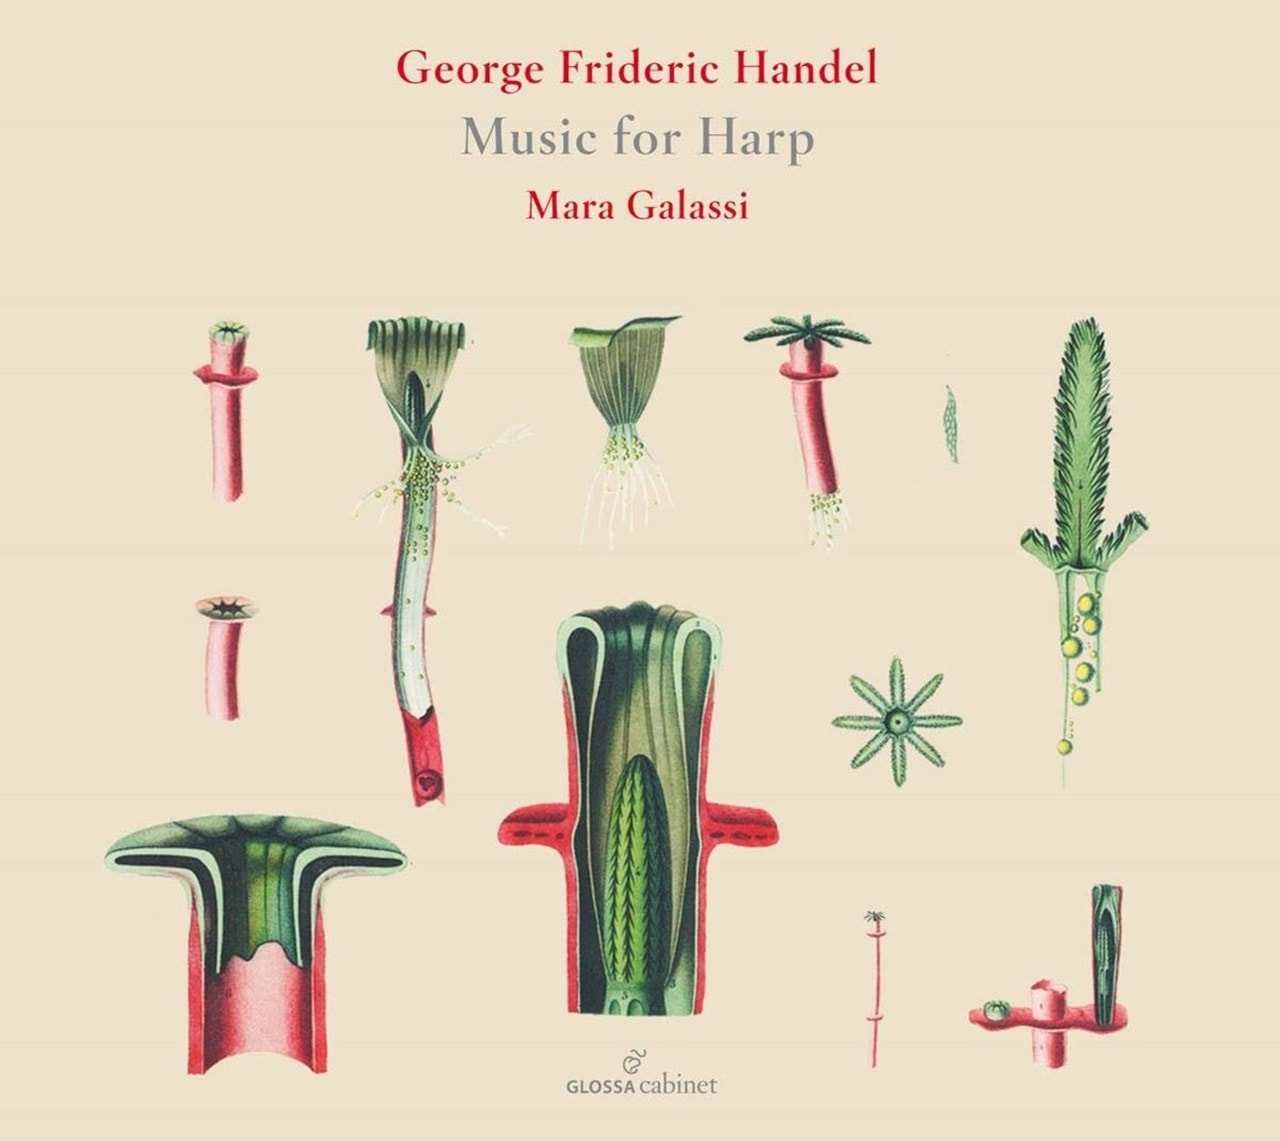 George Frideric Handel: Music for Harp - 1